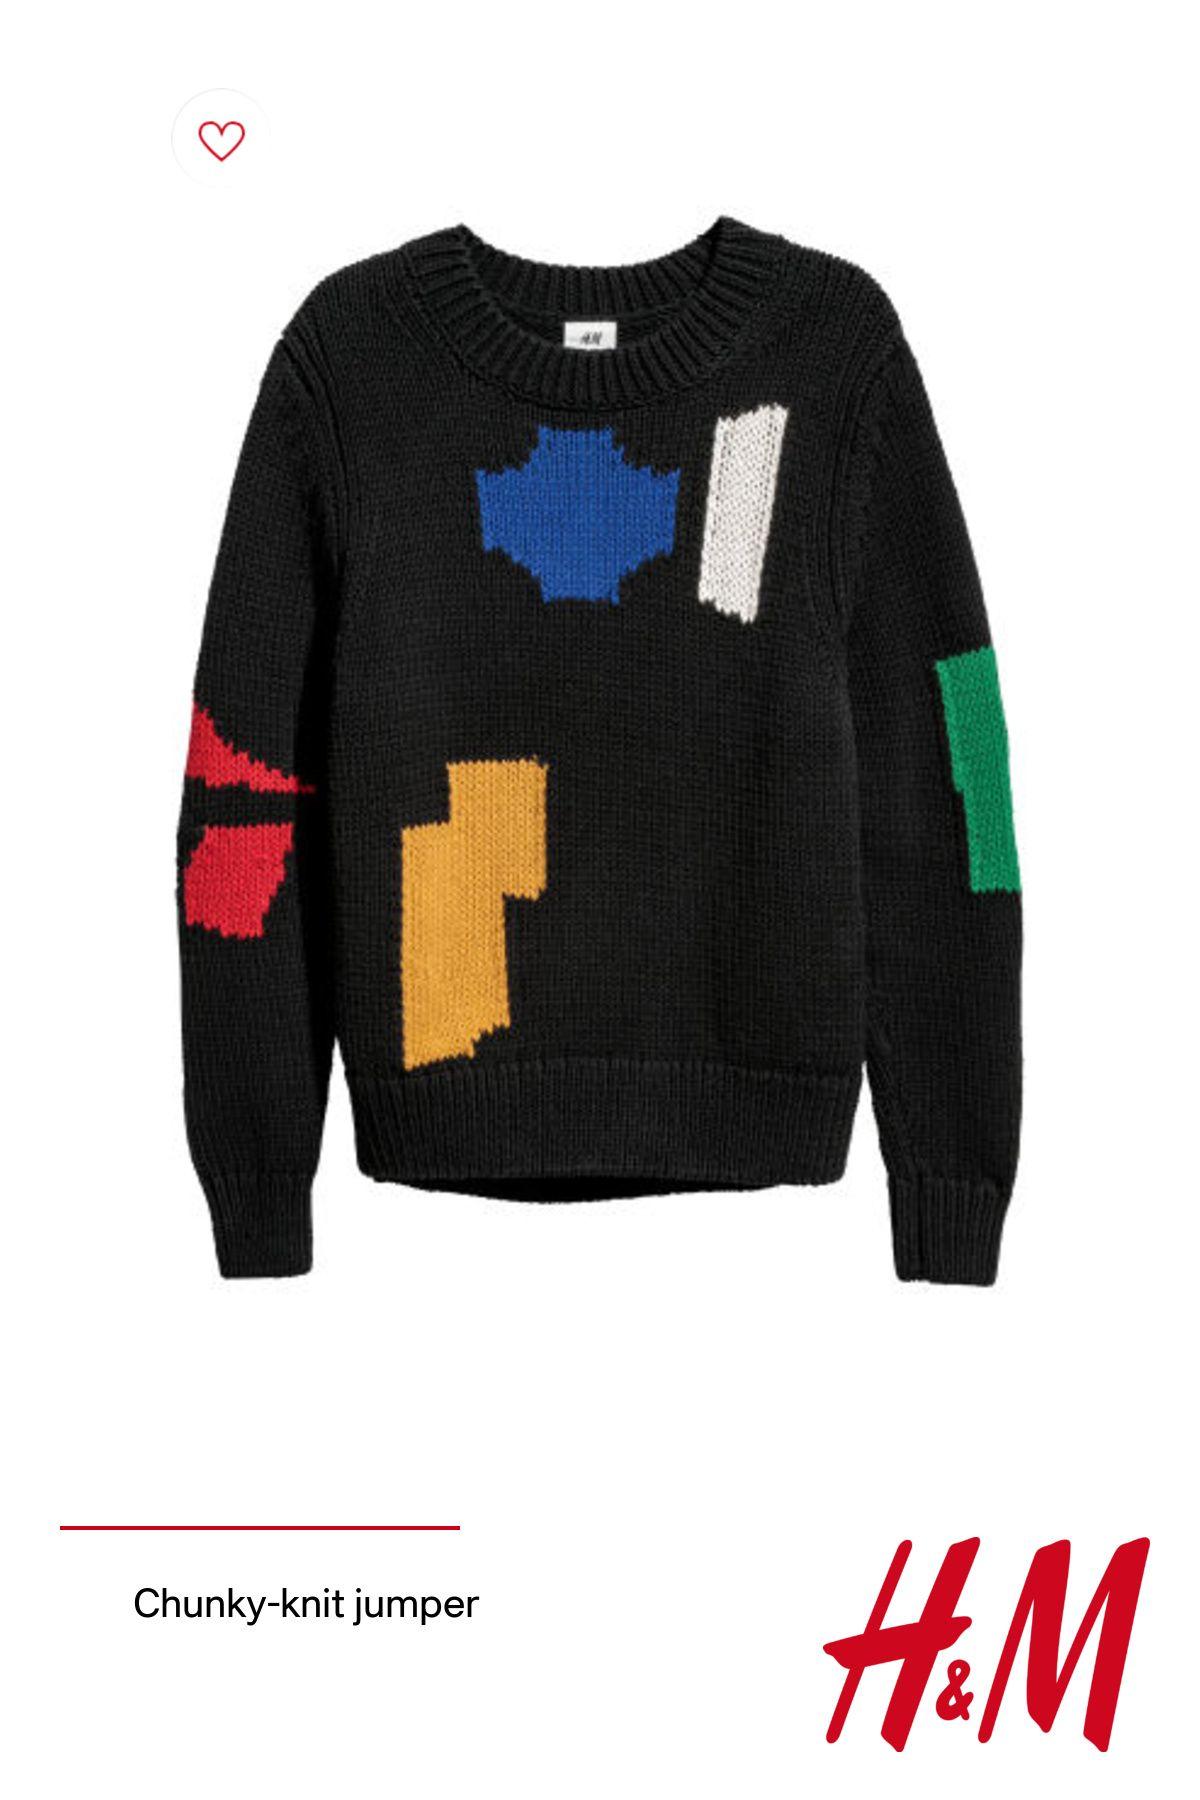 Chunky-knit jumper